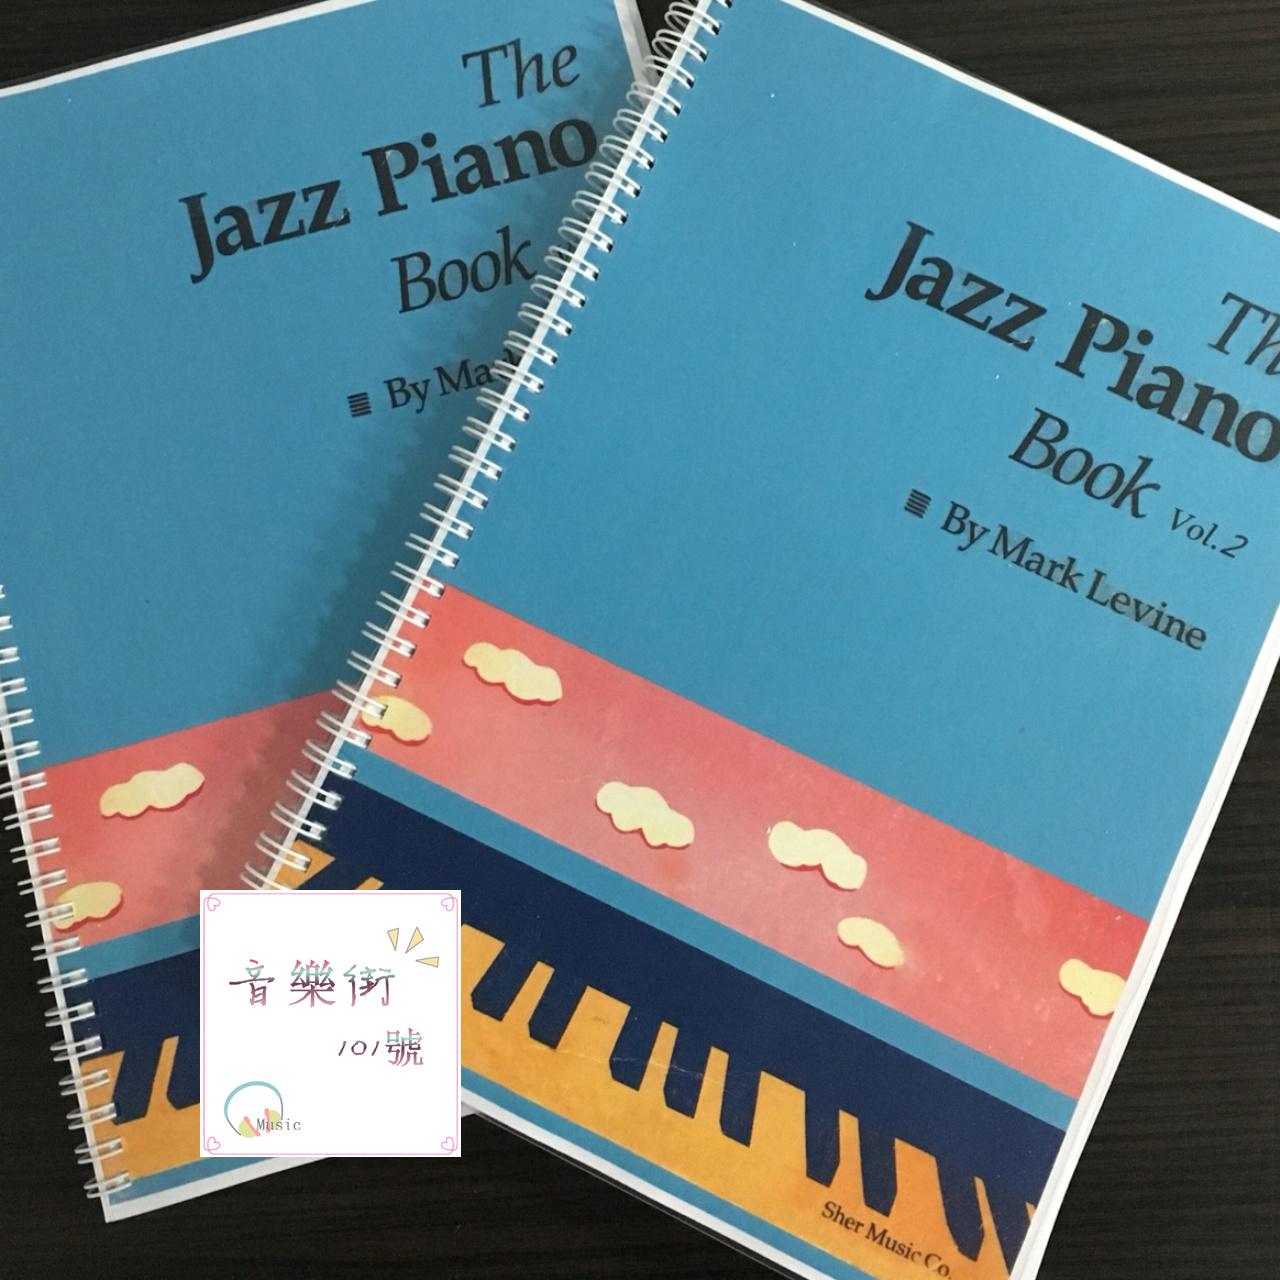 """ с отрывными листами «Piano Book Марк Левин -The Jazz марк строка культура сэр пианино"